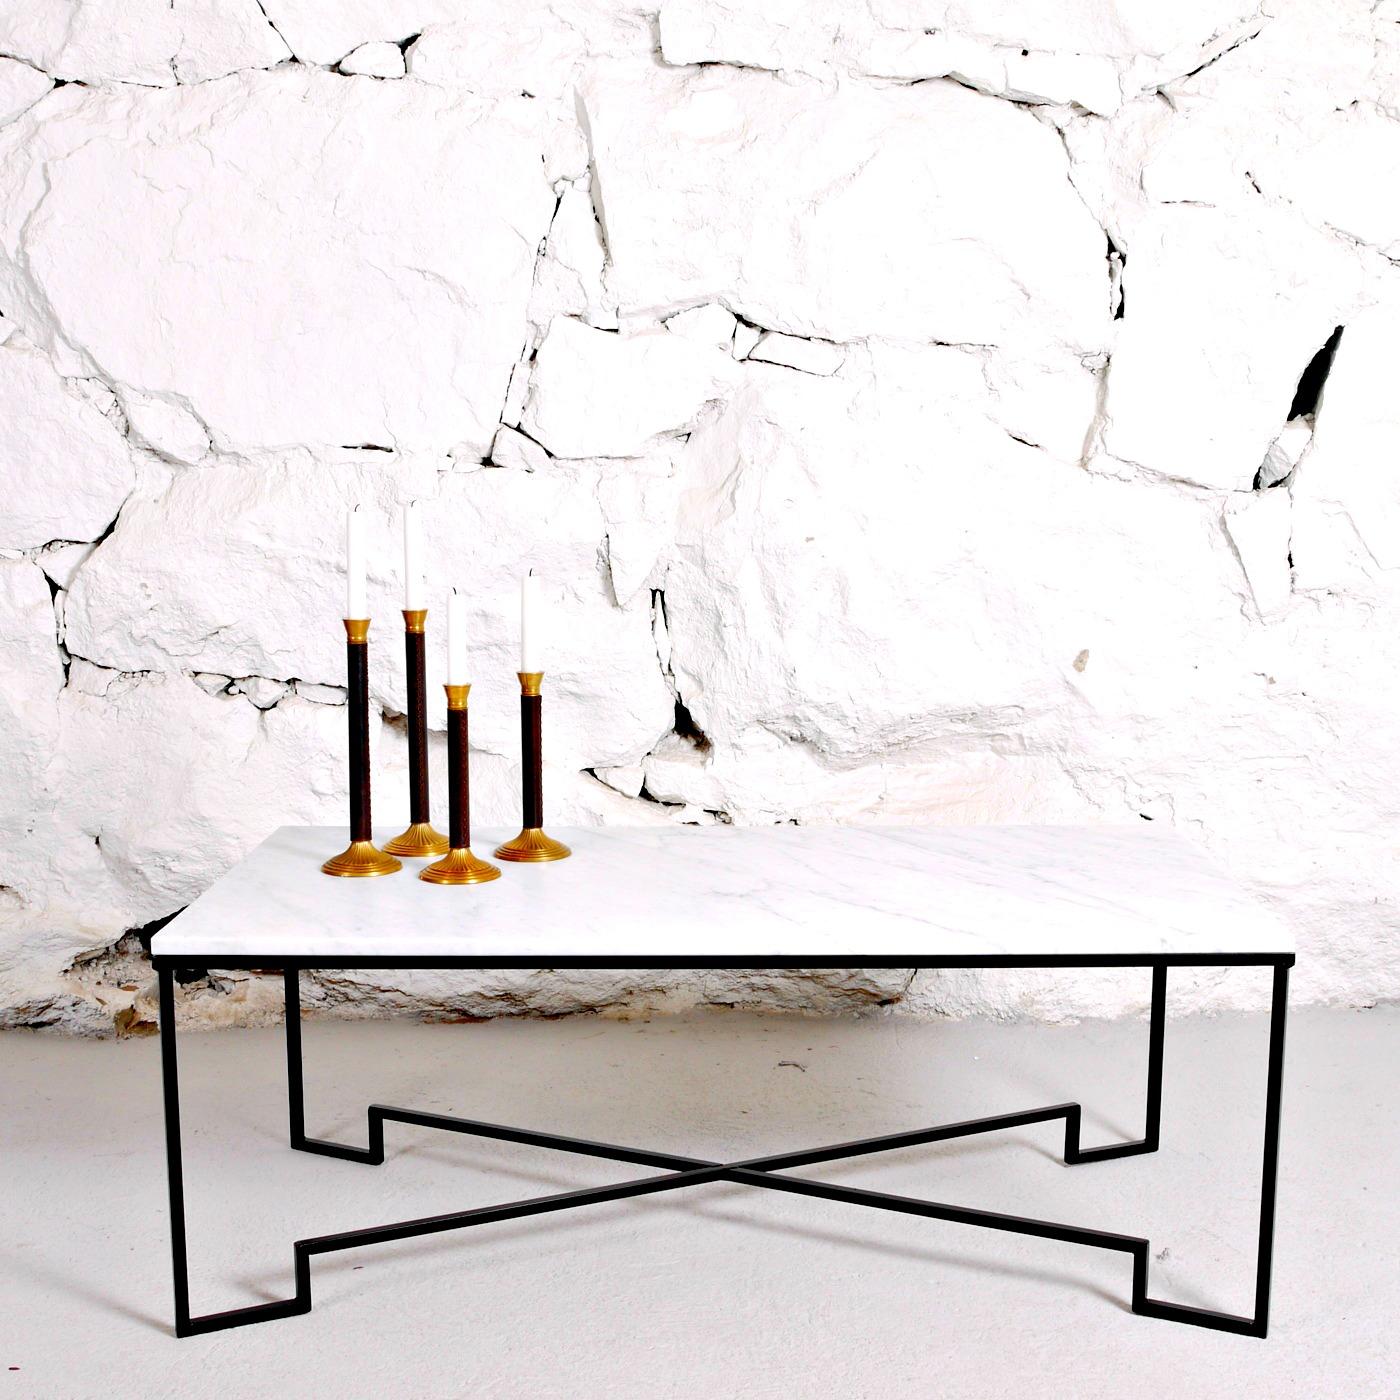 Soffbord i vit marmor, Fogelmarck Form Familjen Fogelmarck